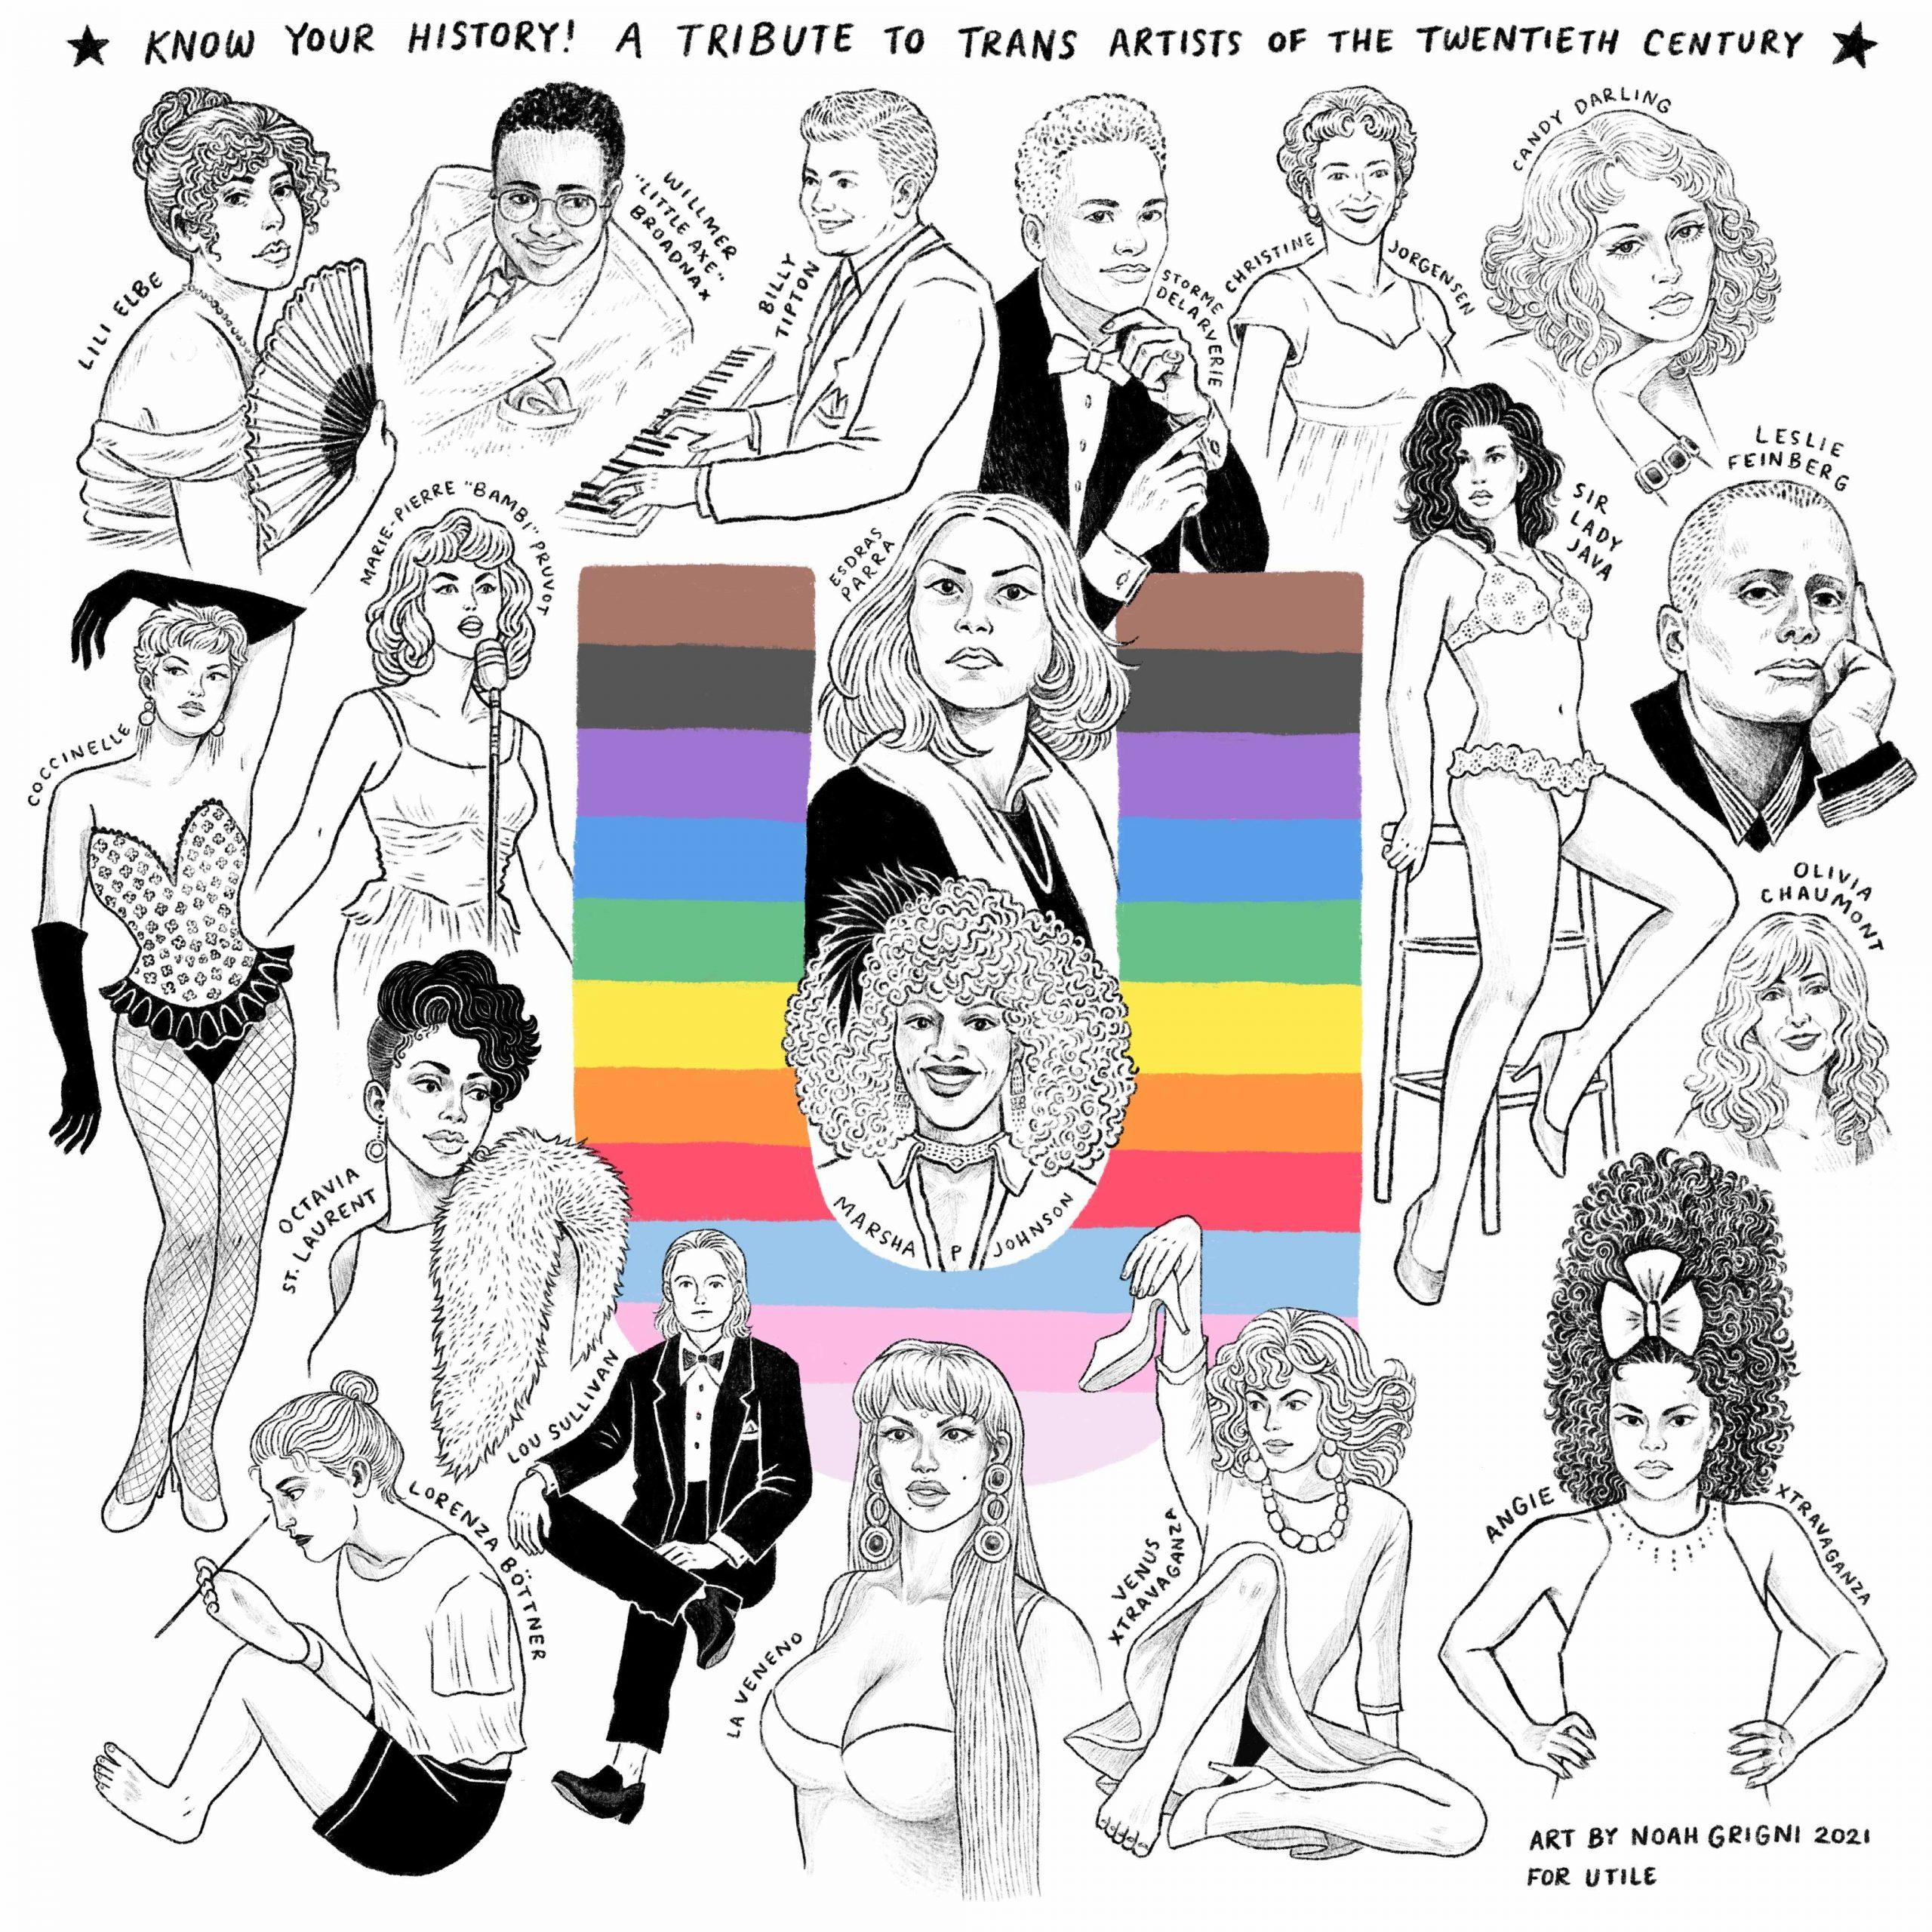 Happy LGBTQIA2S+ Pride Month!